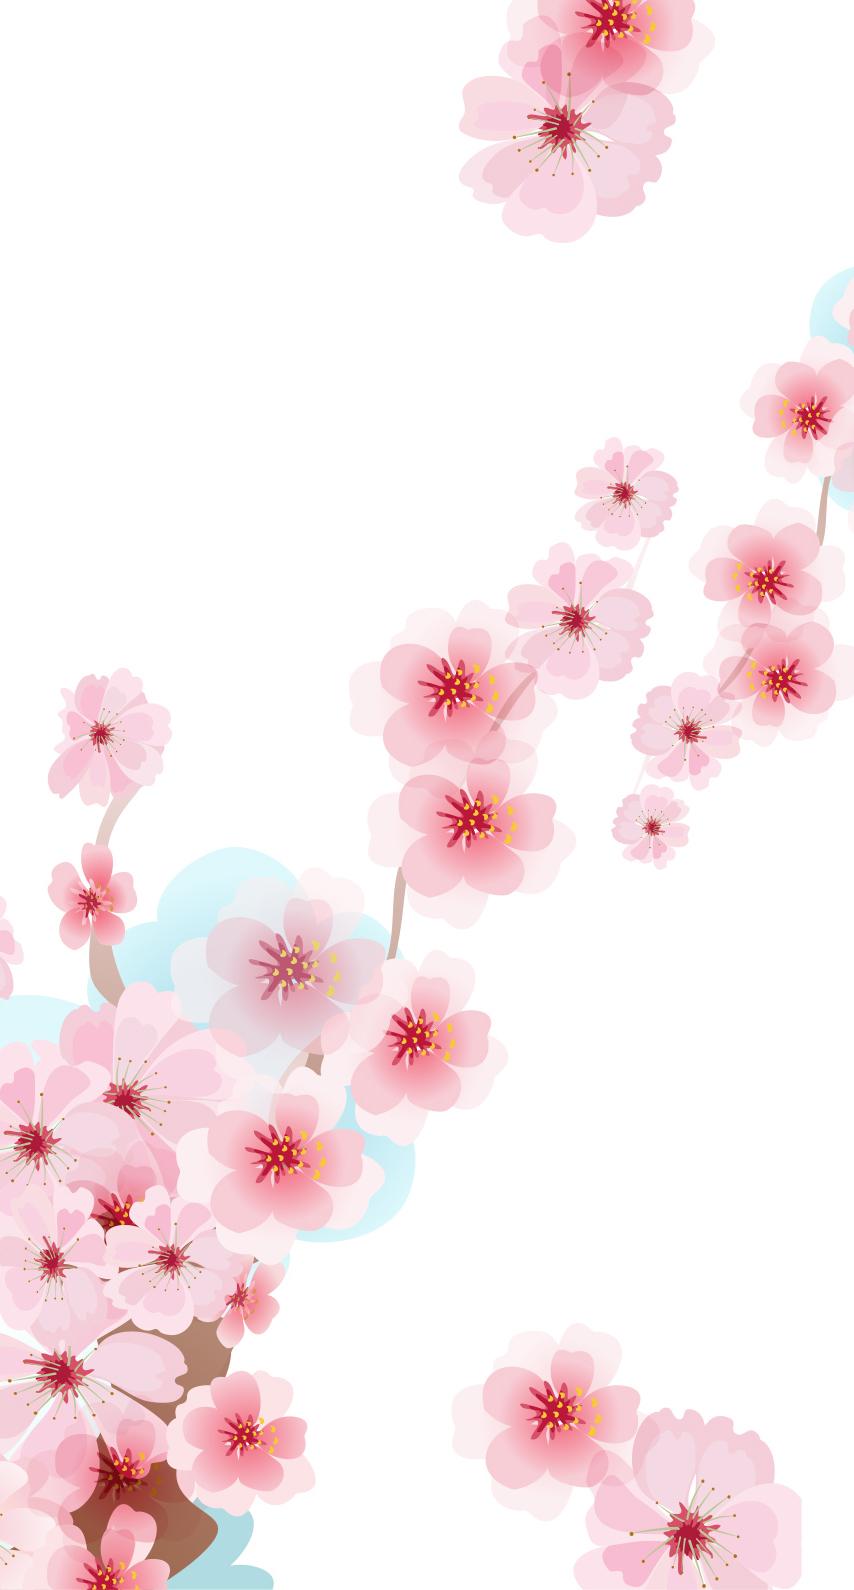 flora, blooming, petal, season, card